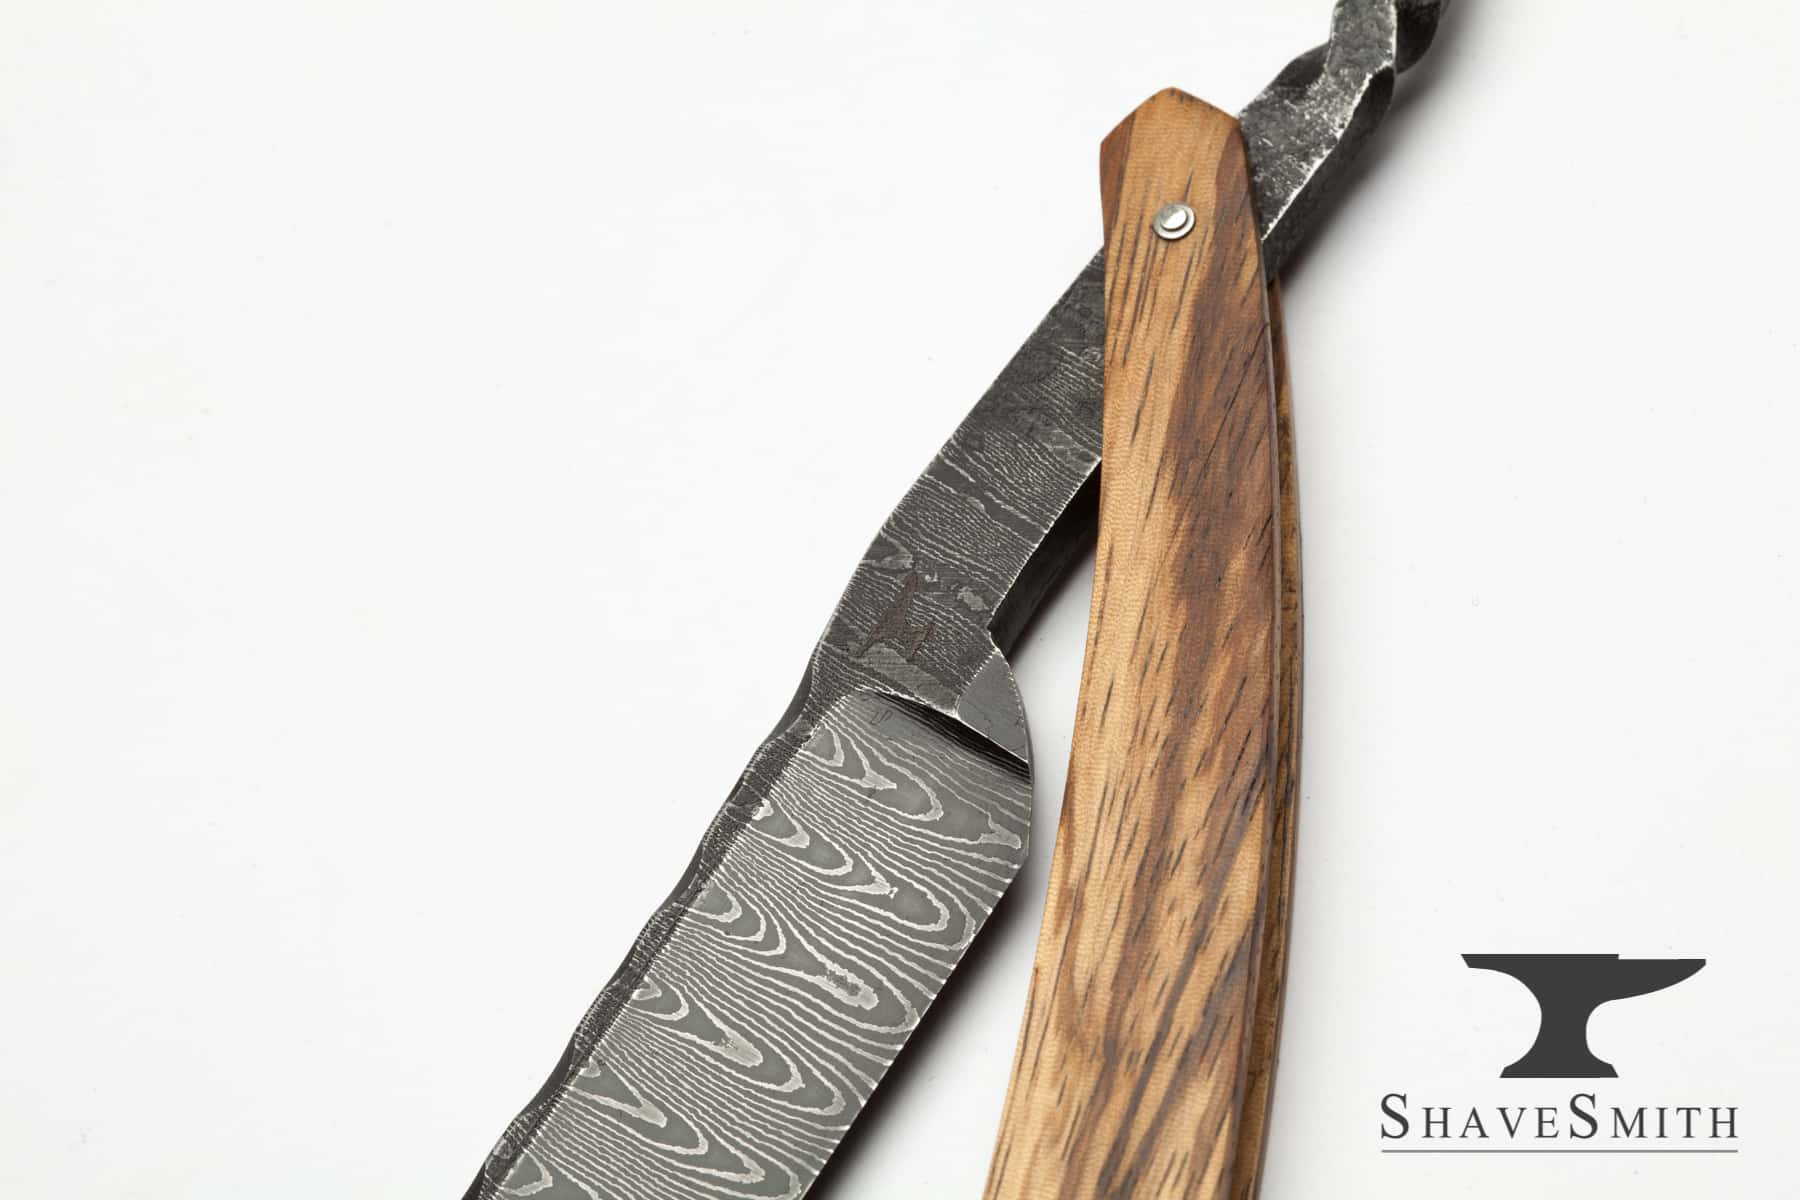 7/8 Wedge Grind, Zebra Wood, Forged, Worked Spine Damascus – Custom Straight Razor